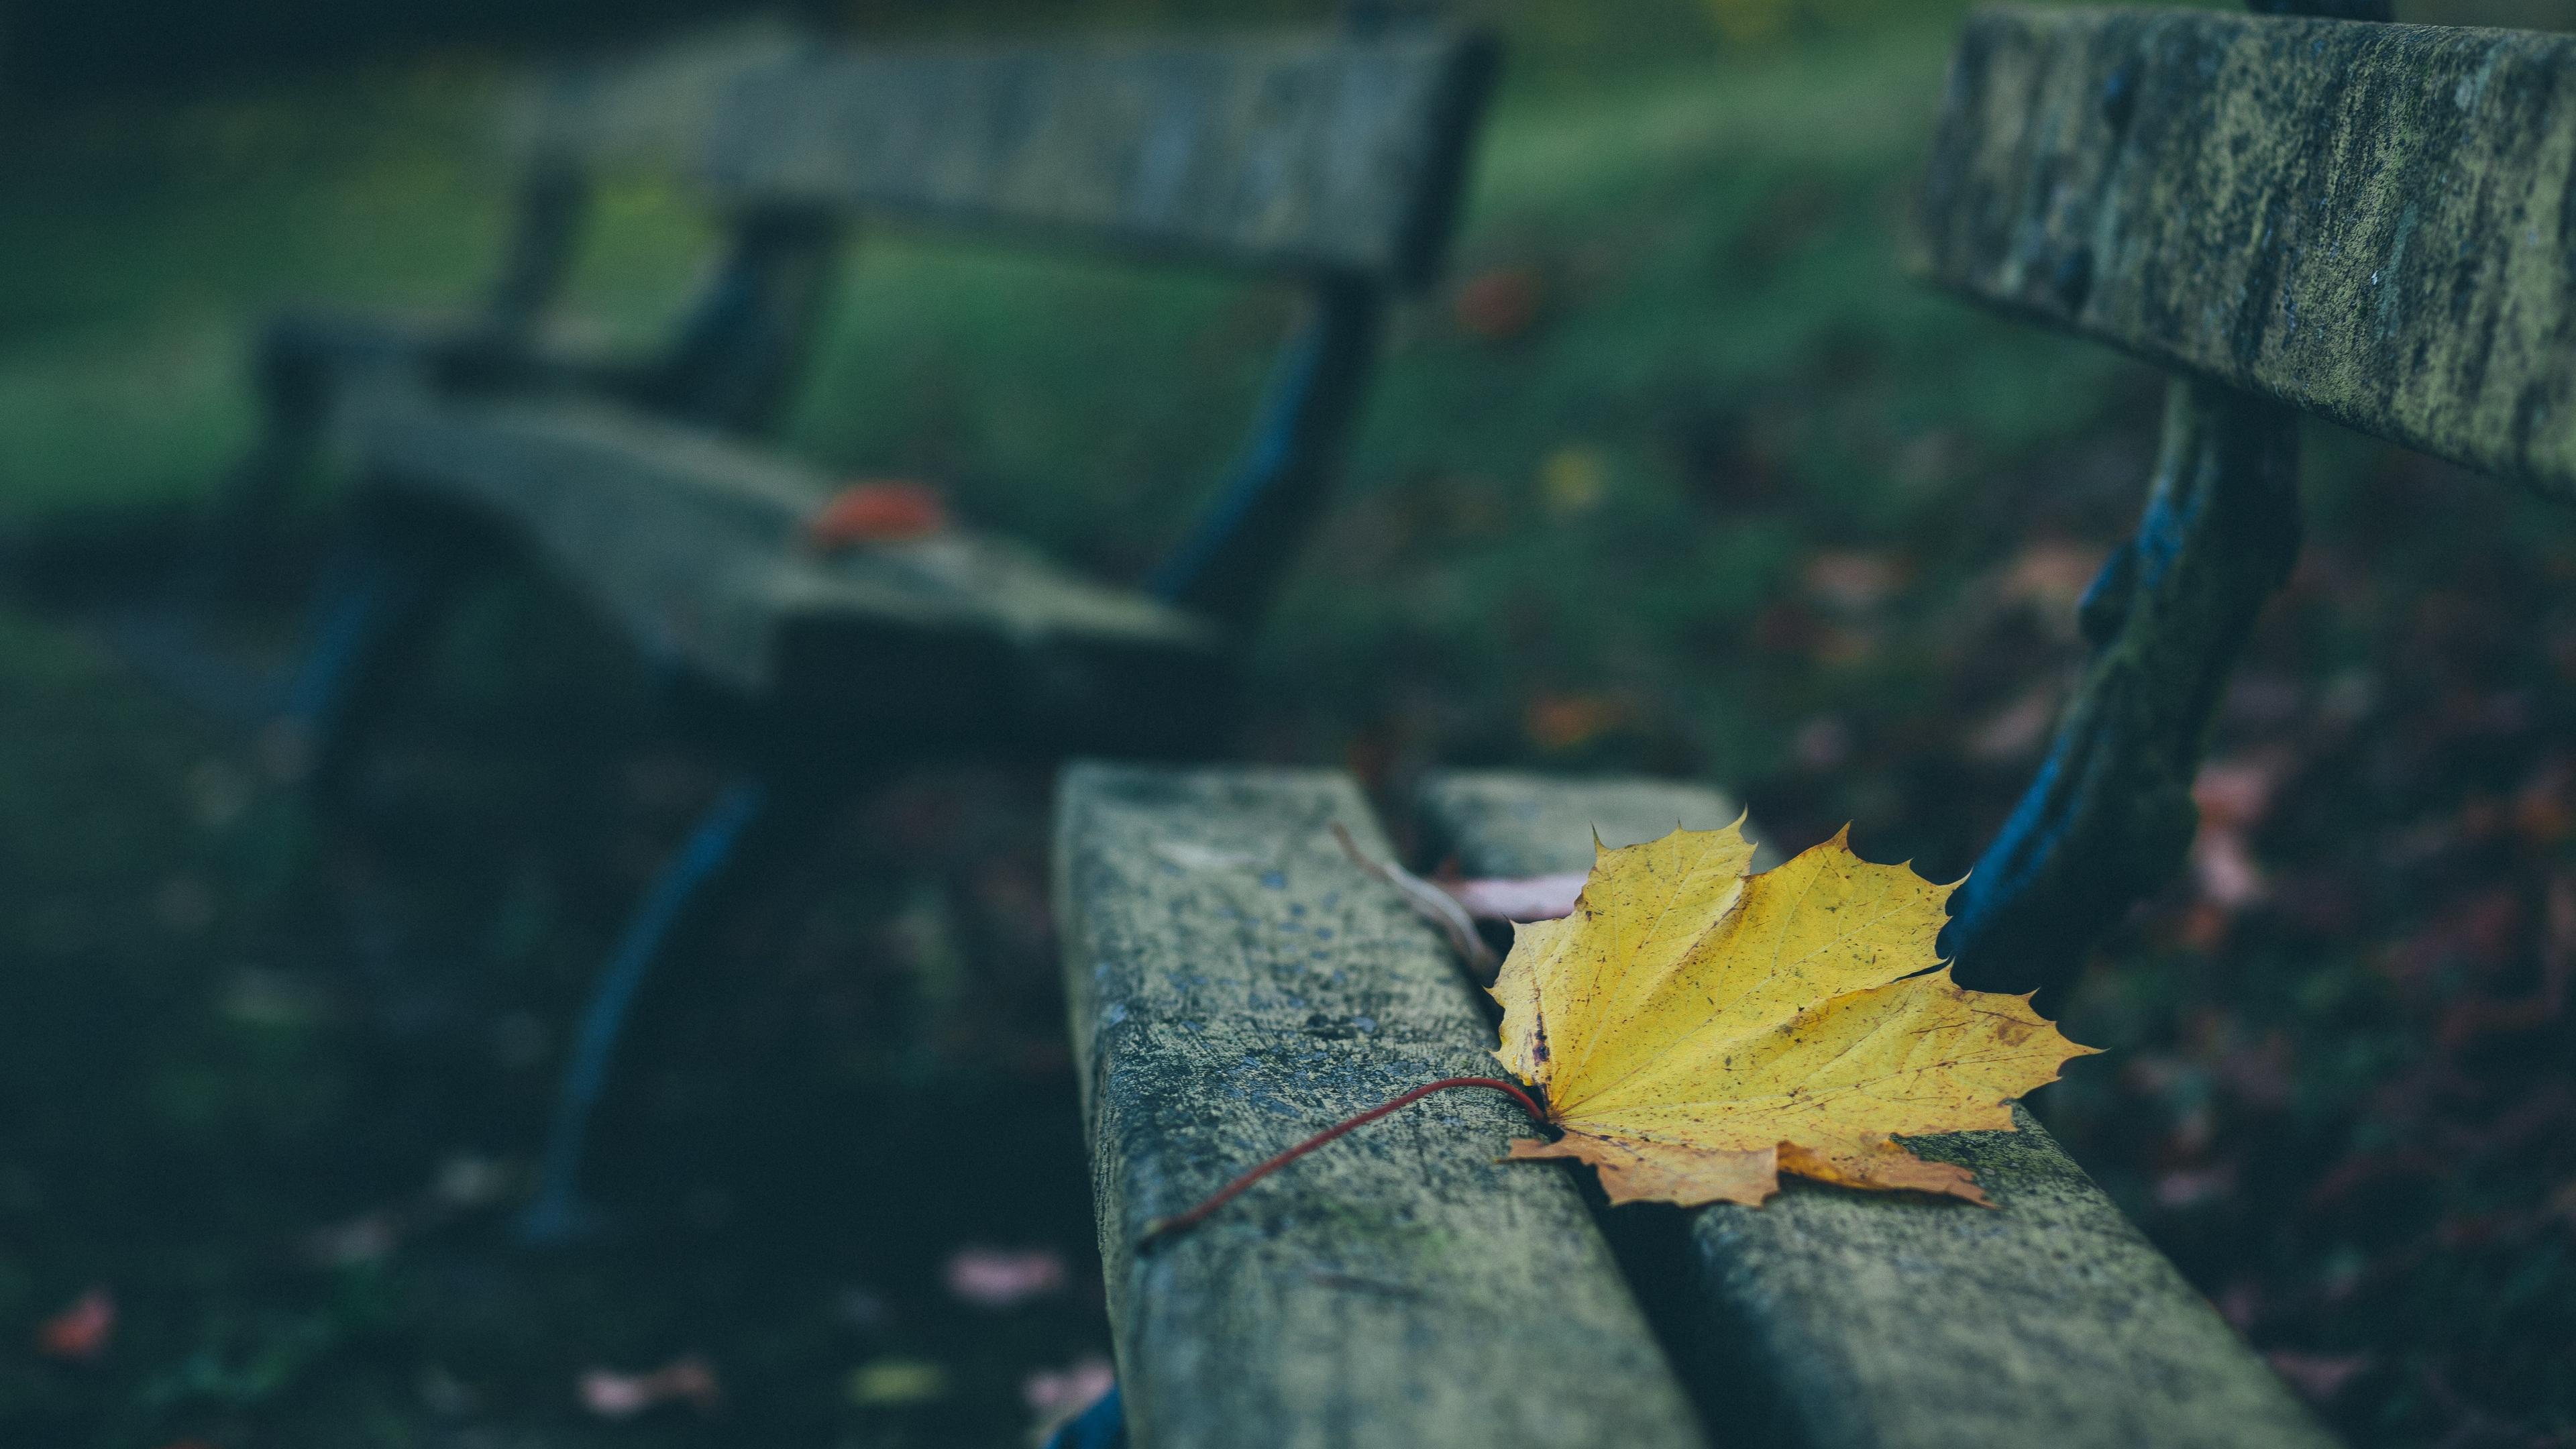 leaves autumn bench 4k 1541116271 - leaves, autumn, bench 4k - Leaves, Bench, Autumn